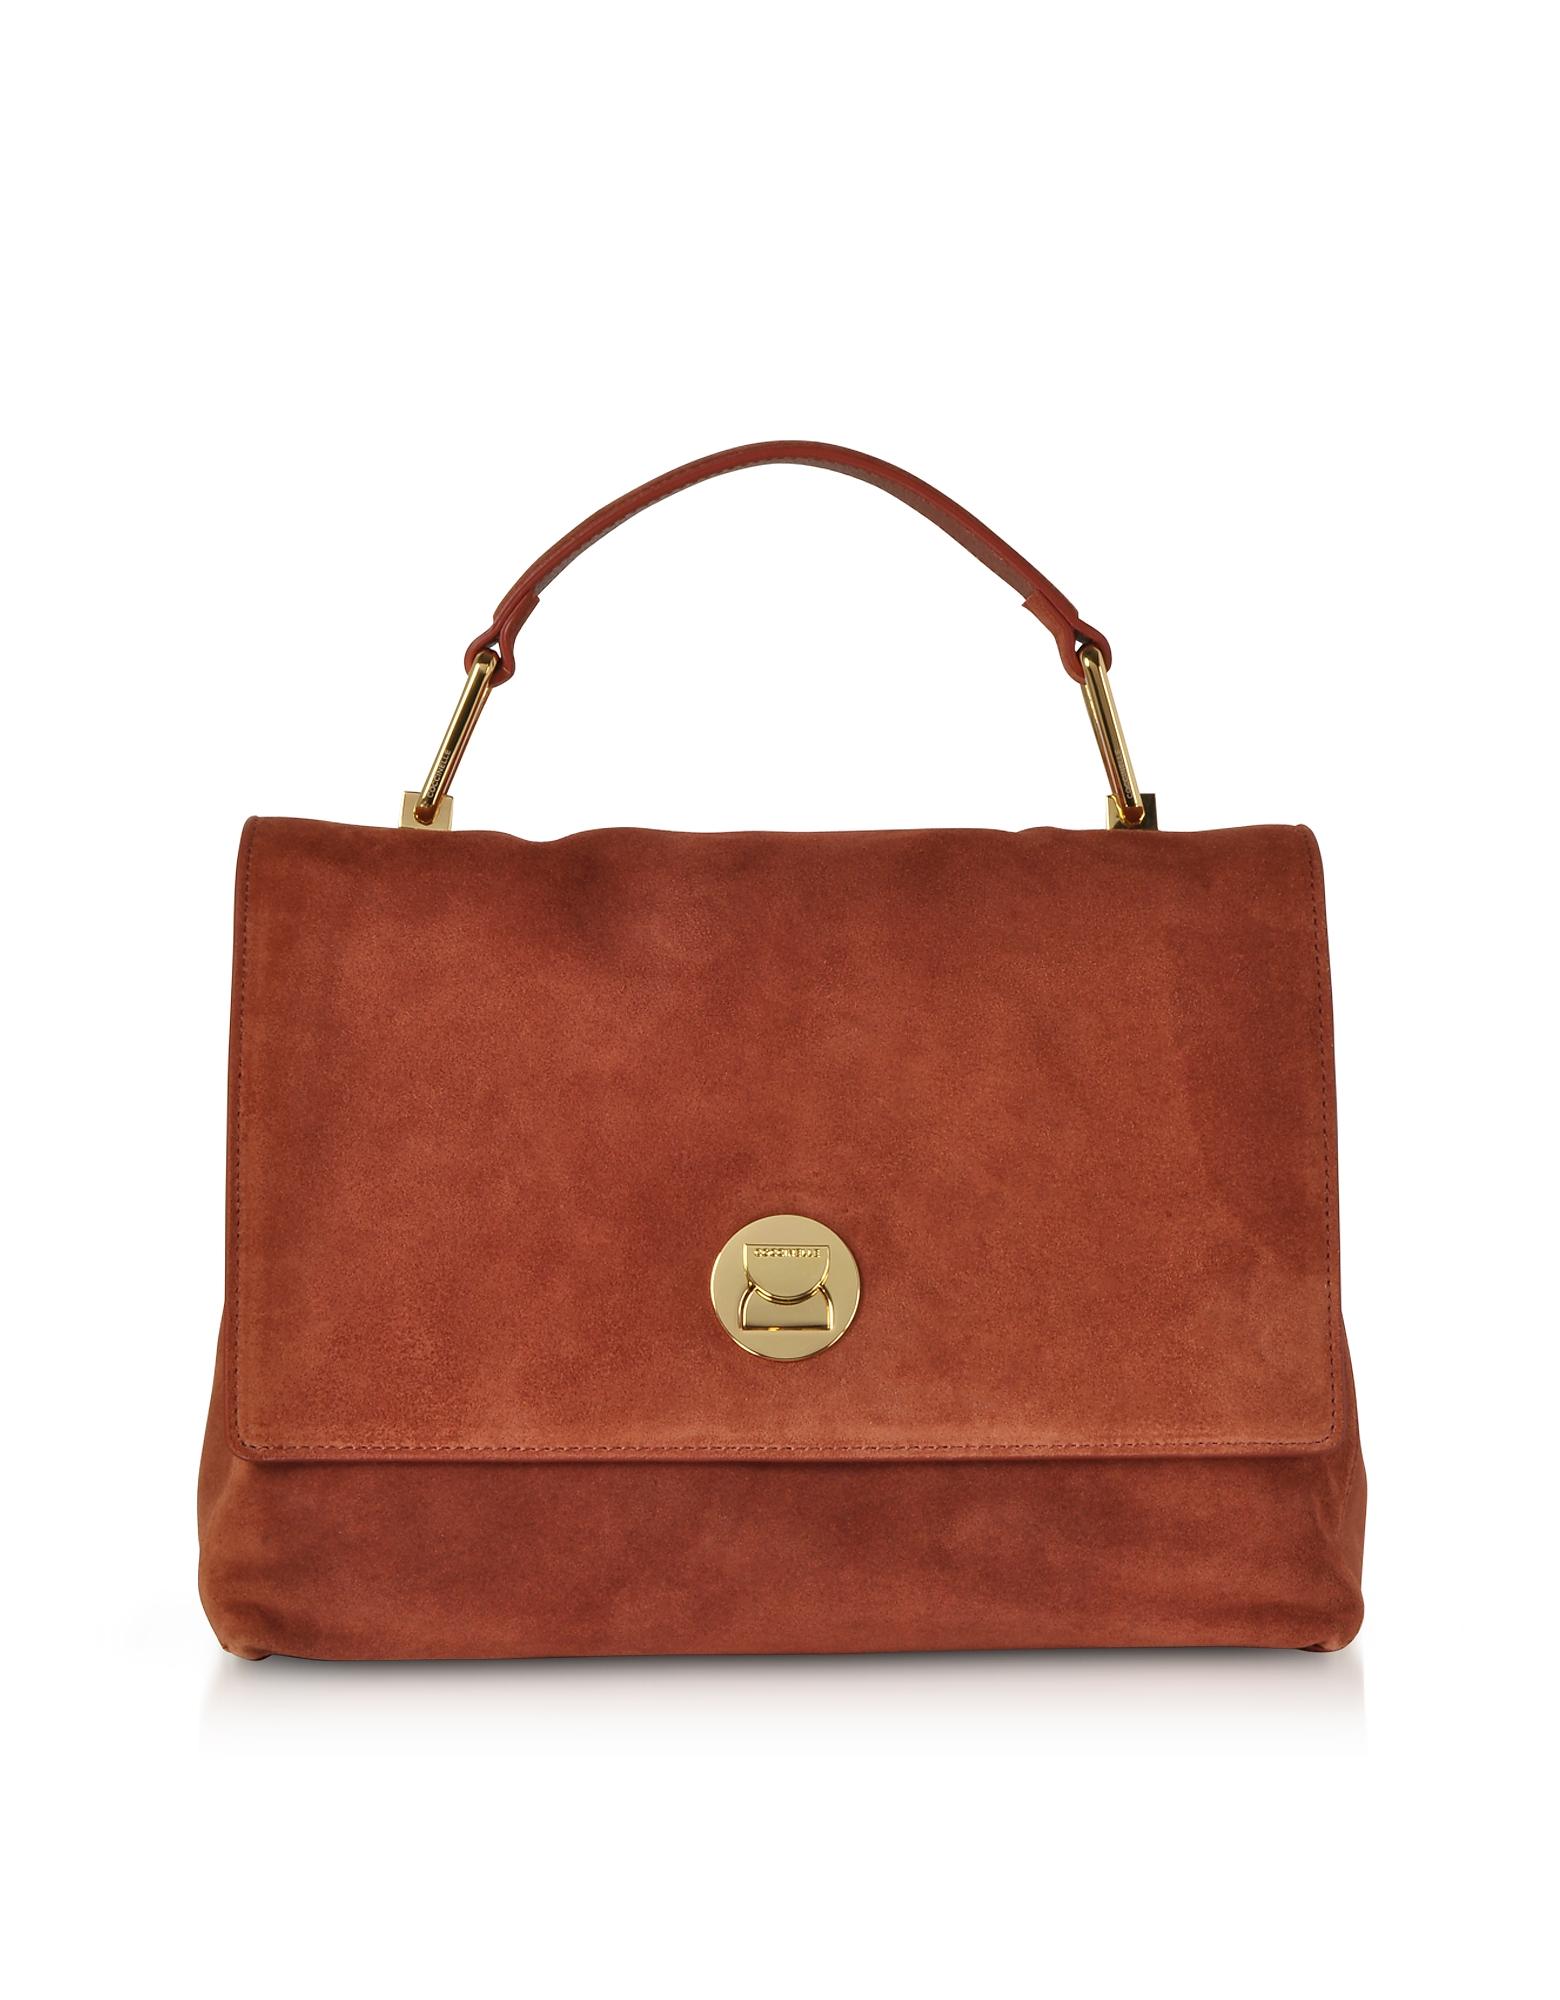 Coccinelle Handbags, Liya Medium Suede Satchel Bag